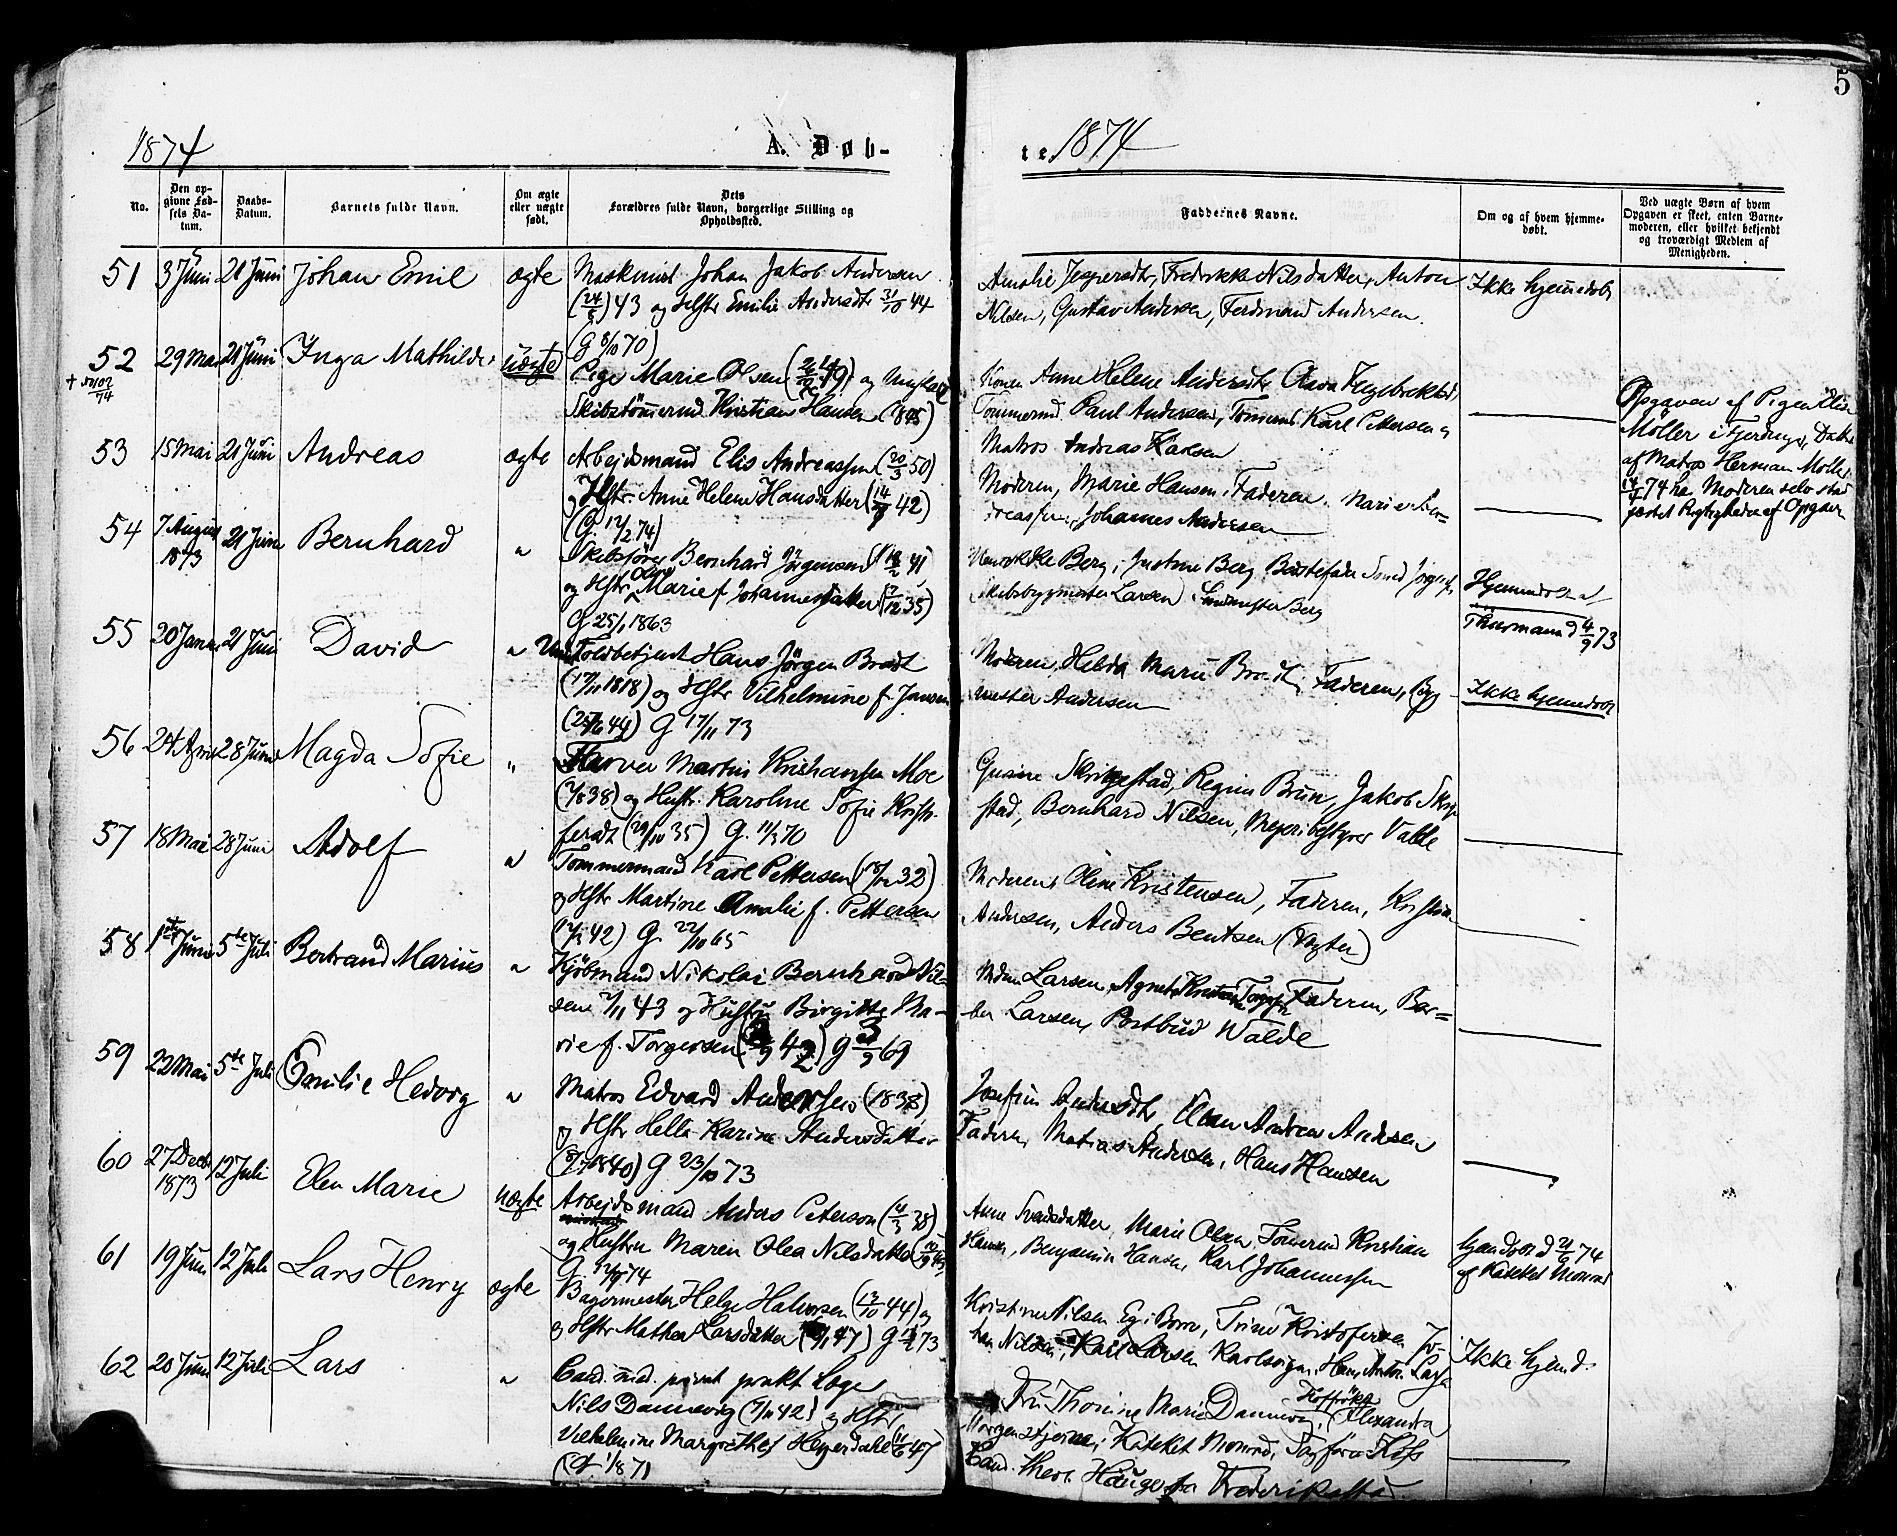 SAKO, Tønsberg kirkebøker, F/Fa/L0010: Ministerialbok nr. I 10, 1874-1880, s. 5